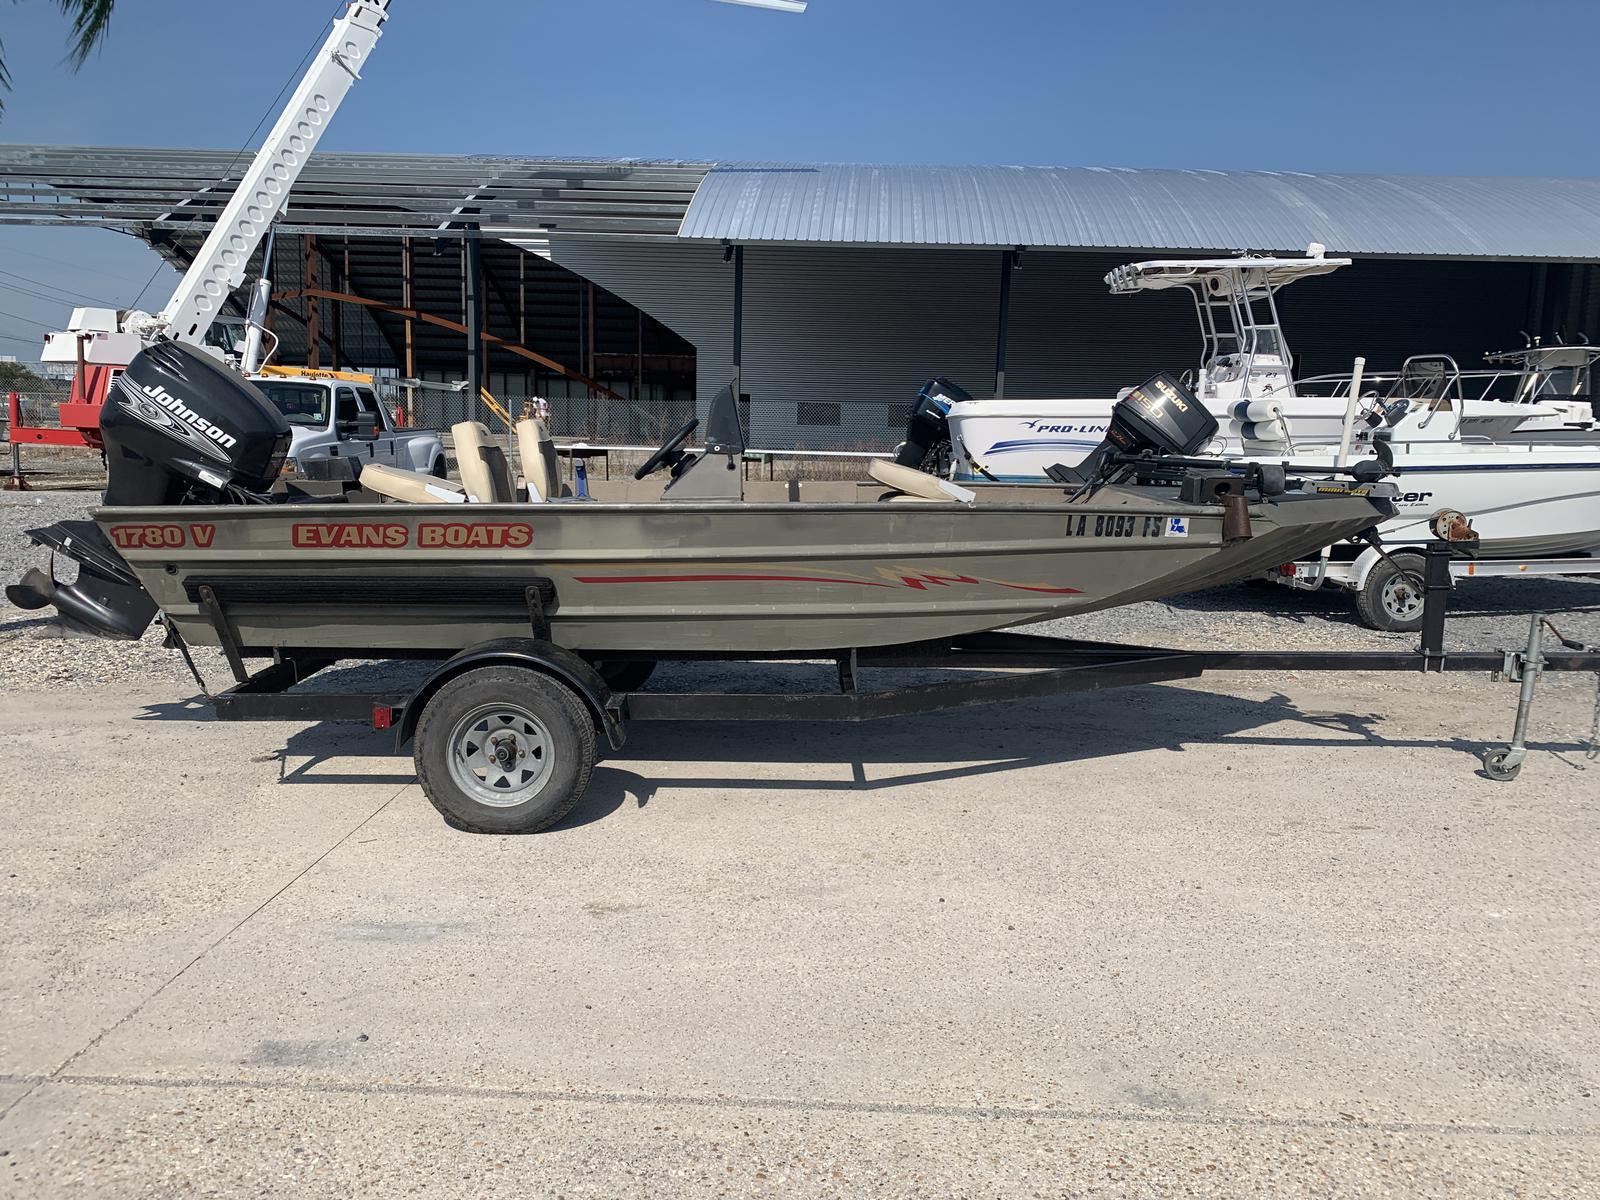 2007 WeldBilt 16 boat for sale, model of the boat is 16 & Image # 1 of 7